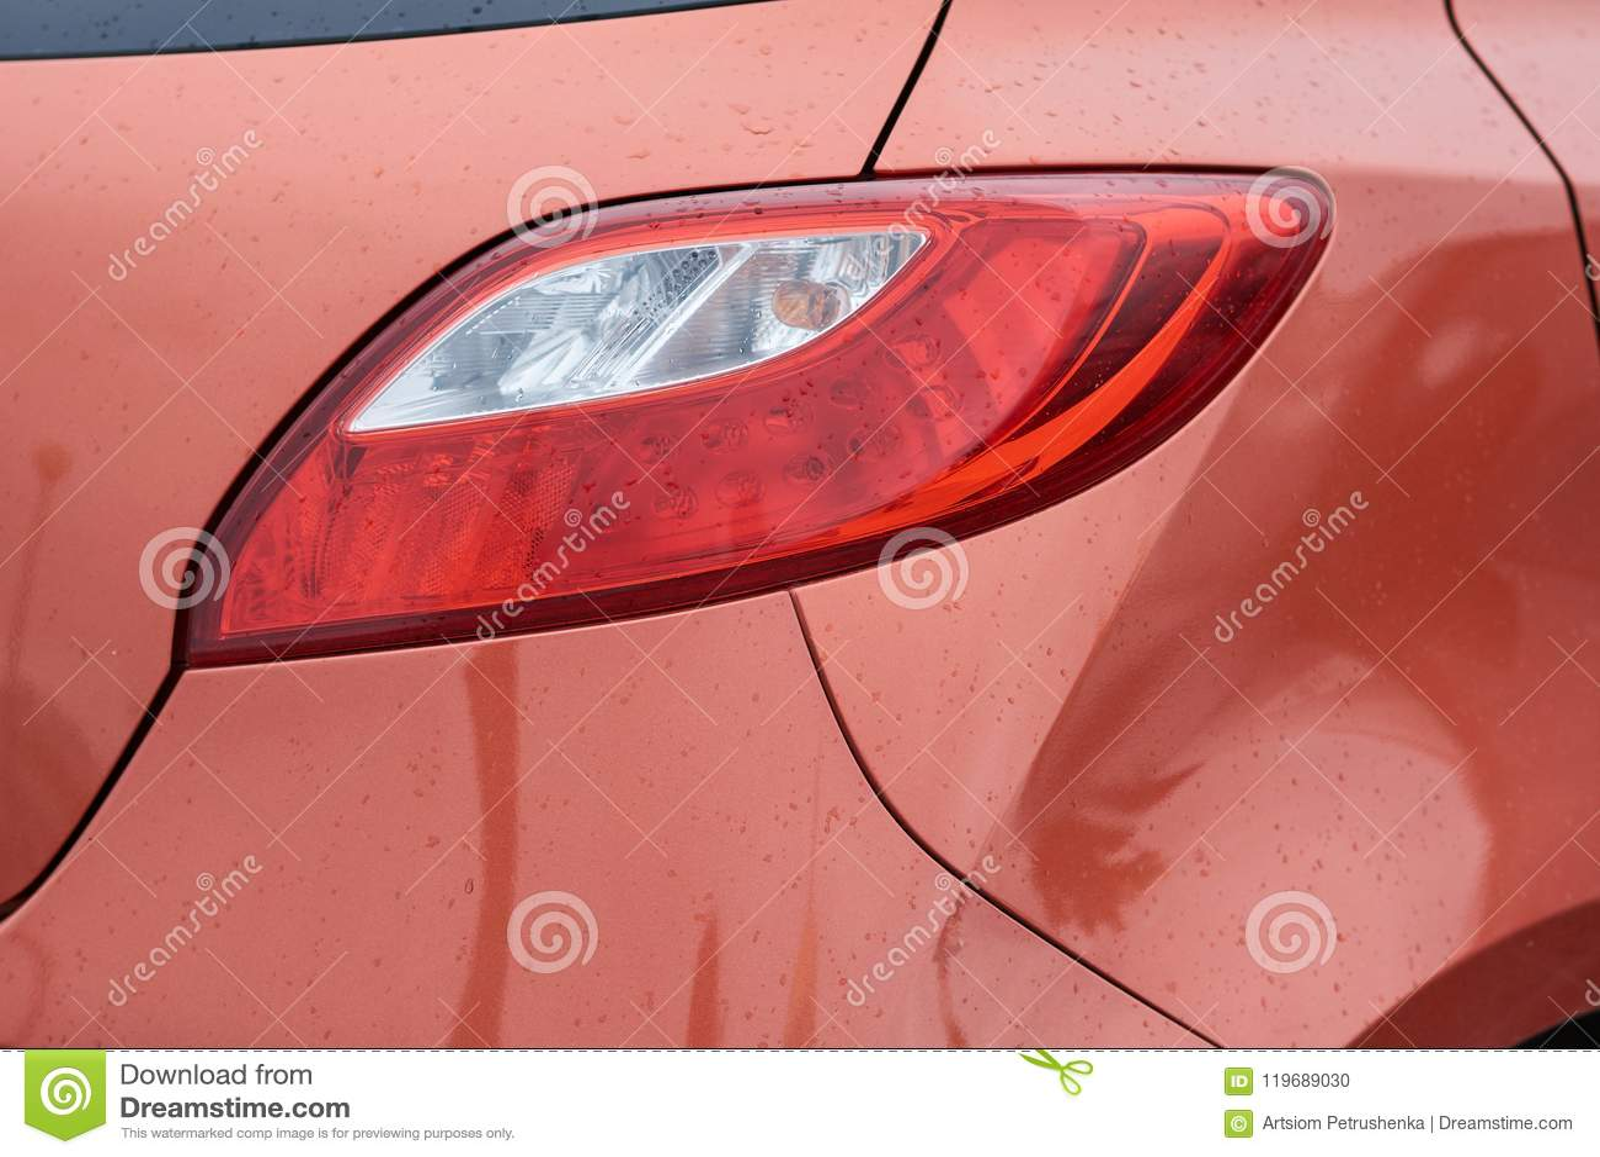 Red sports car rear light